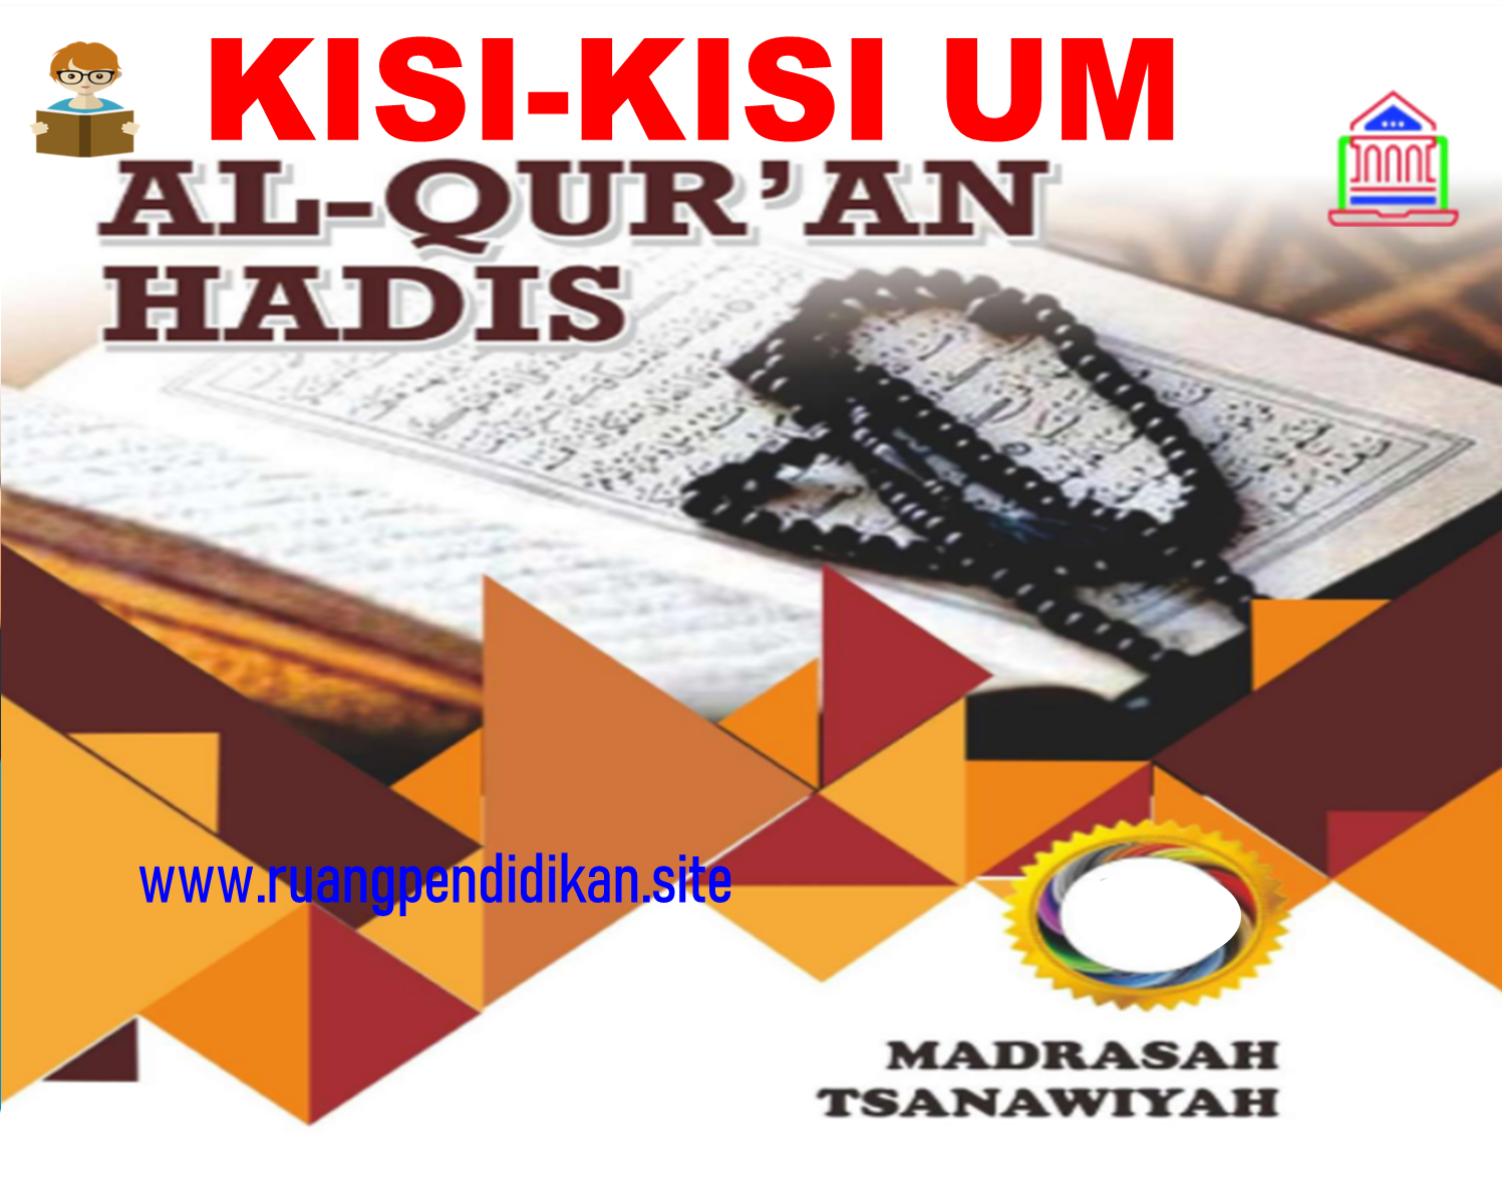 Kisi-kisi UM Al-Qur'an Hadis Jenjang MTs